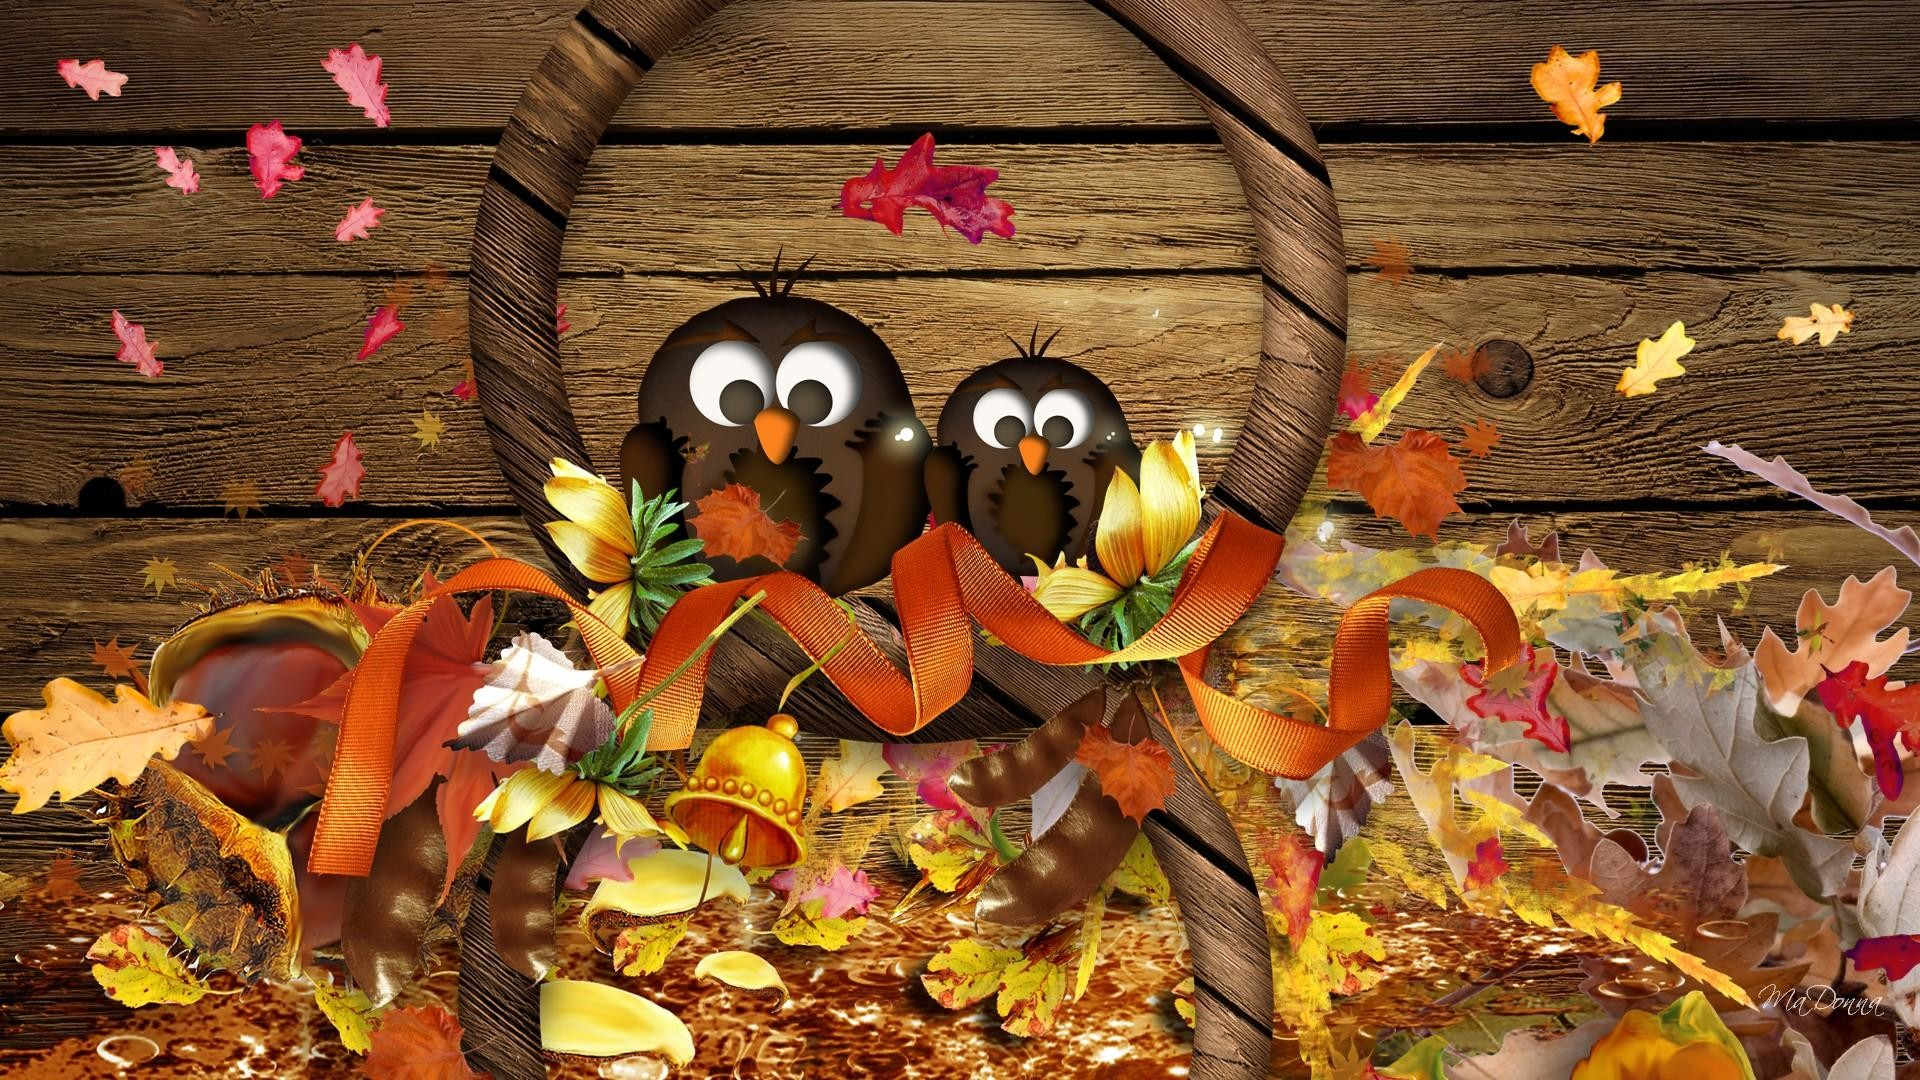 wallpaper cute thanksgiving download - photo #1